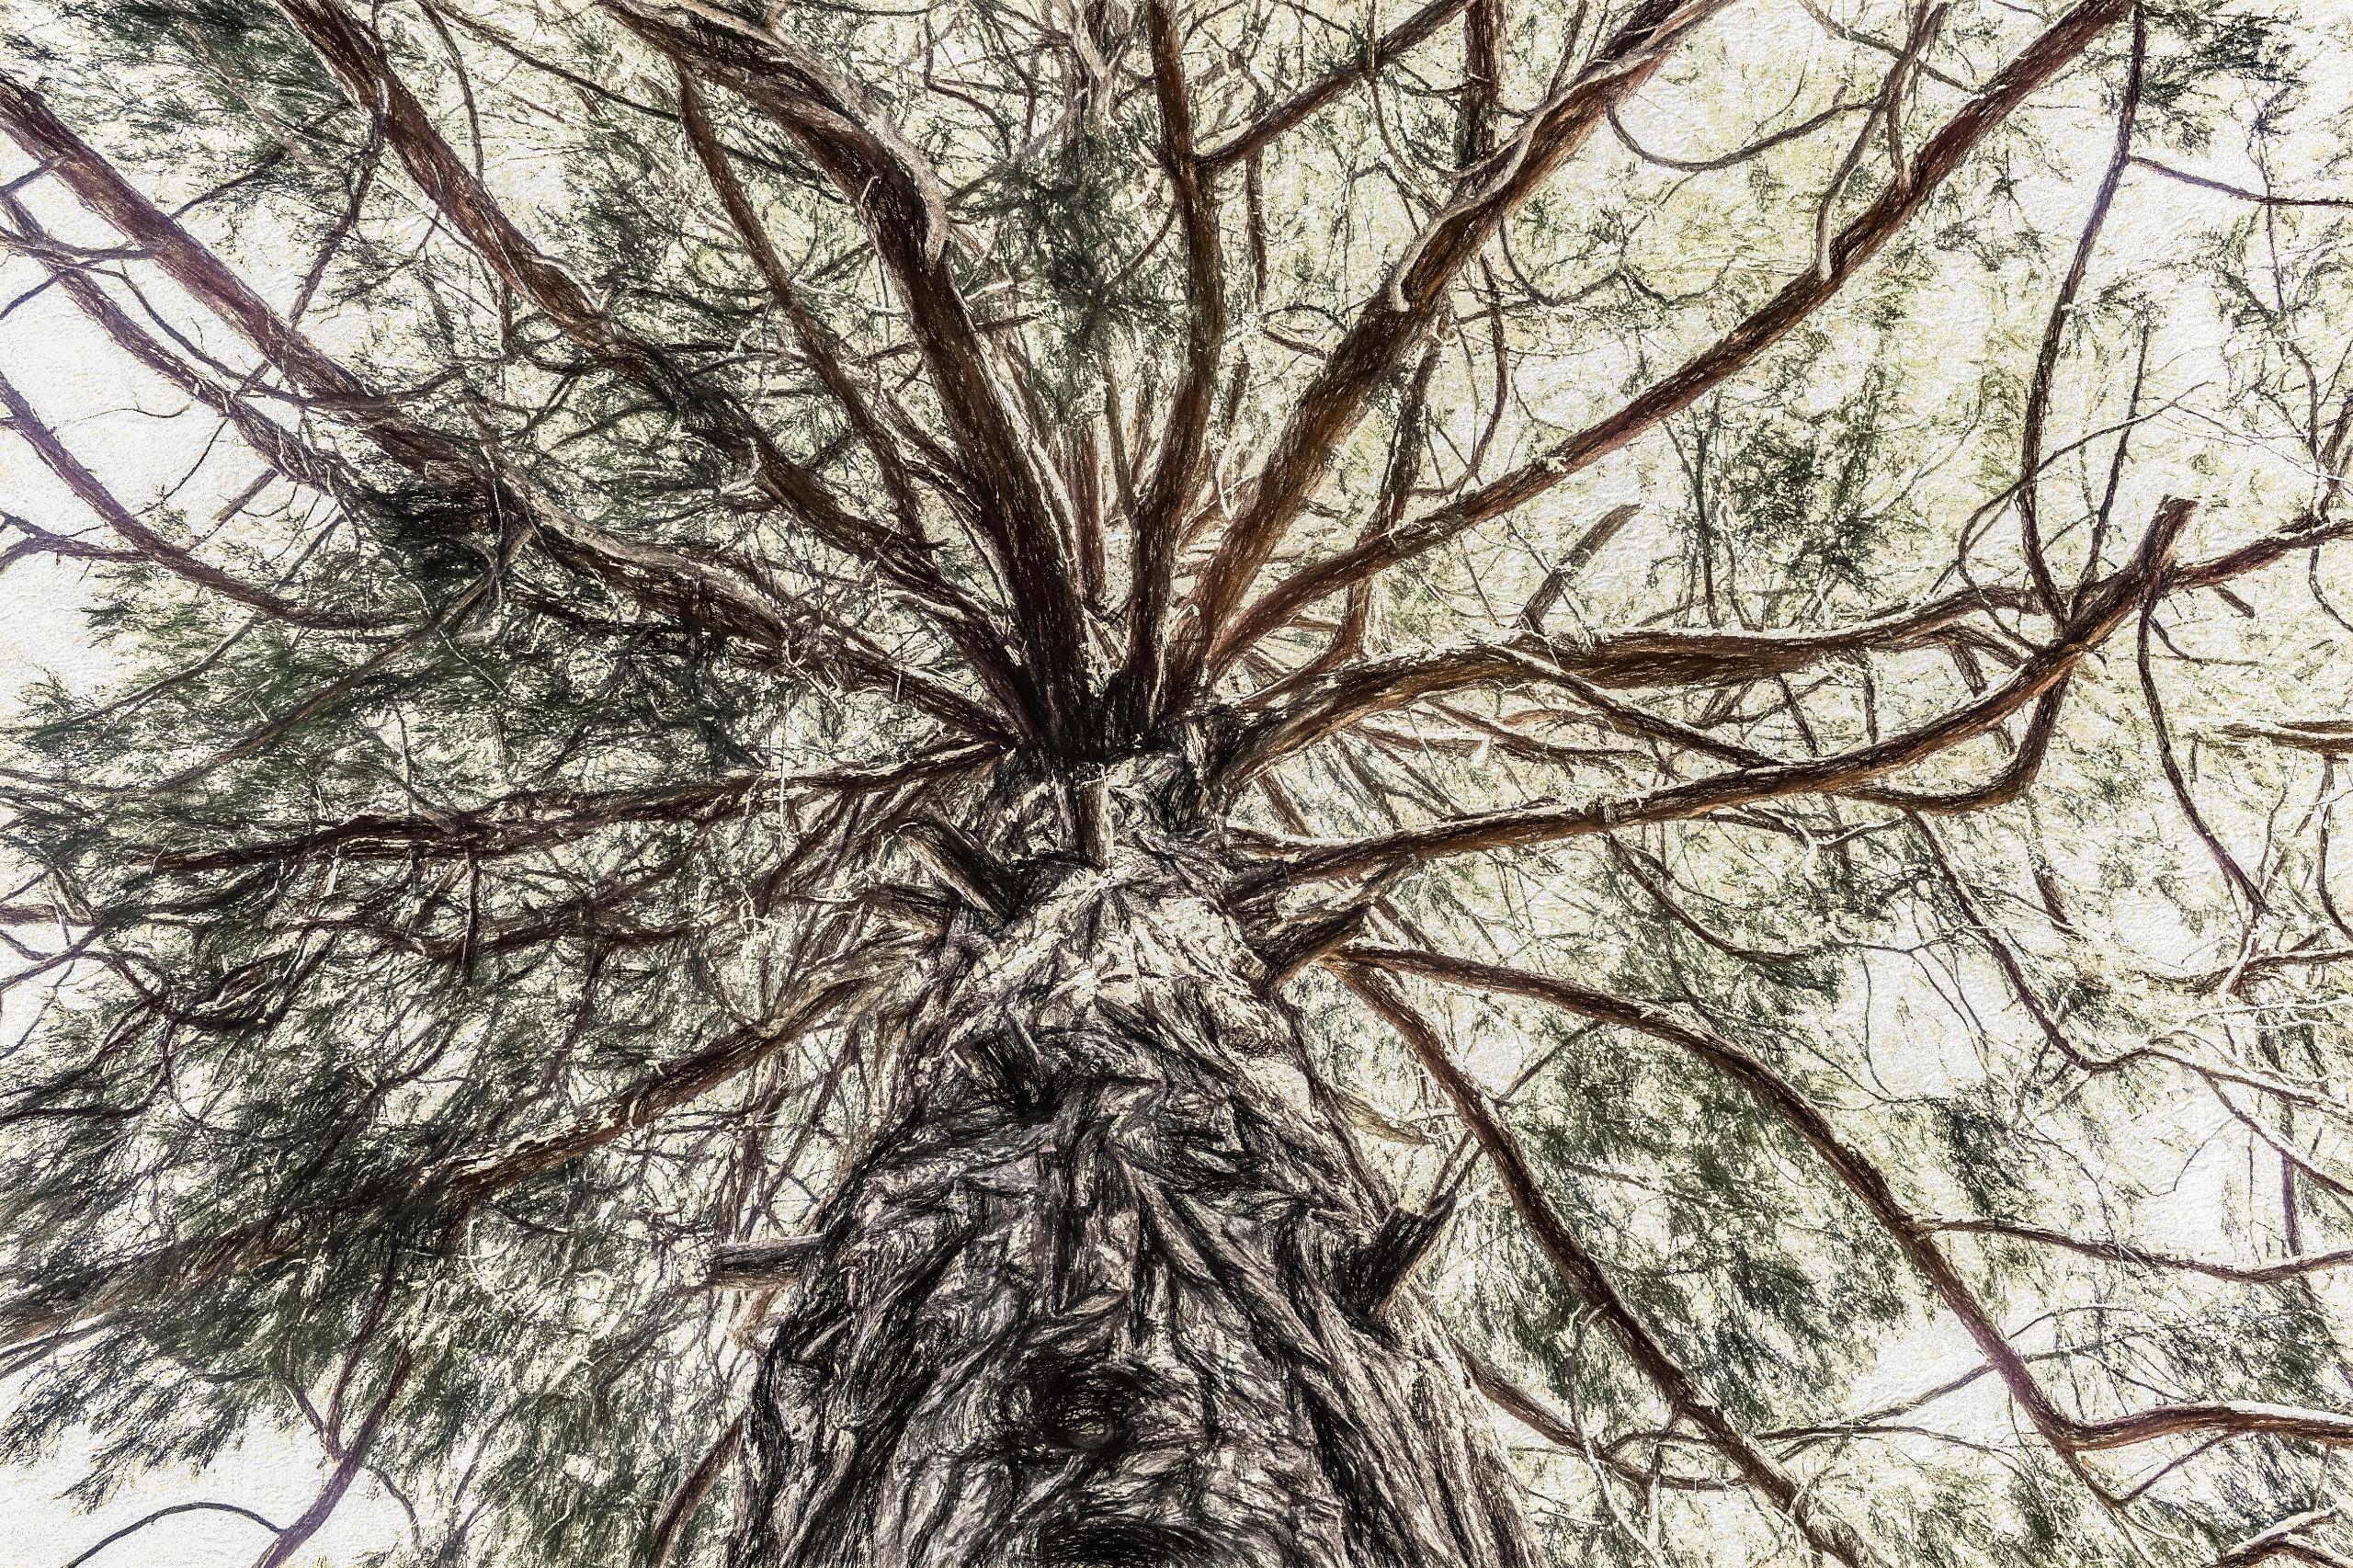 Wiseman Terrance Tree locally W - davidseibold | ello